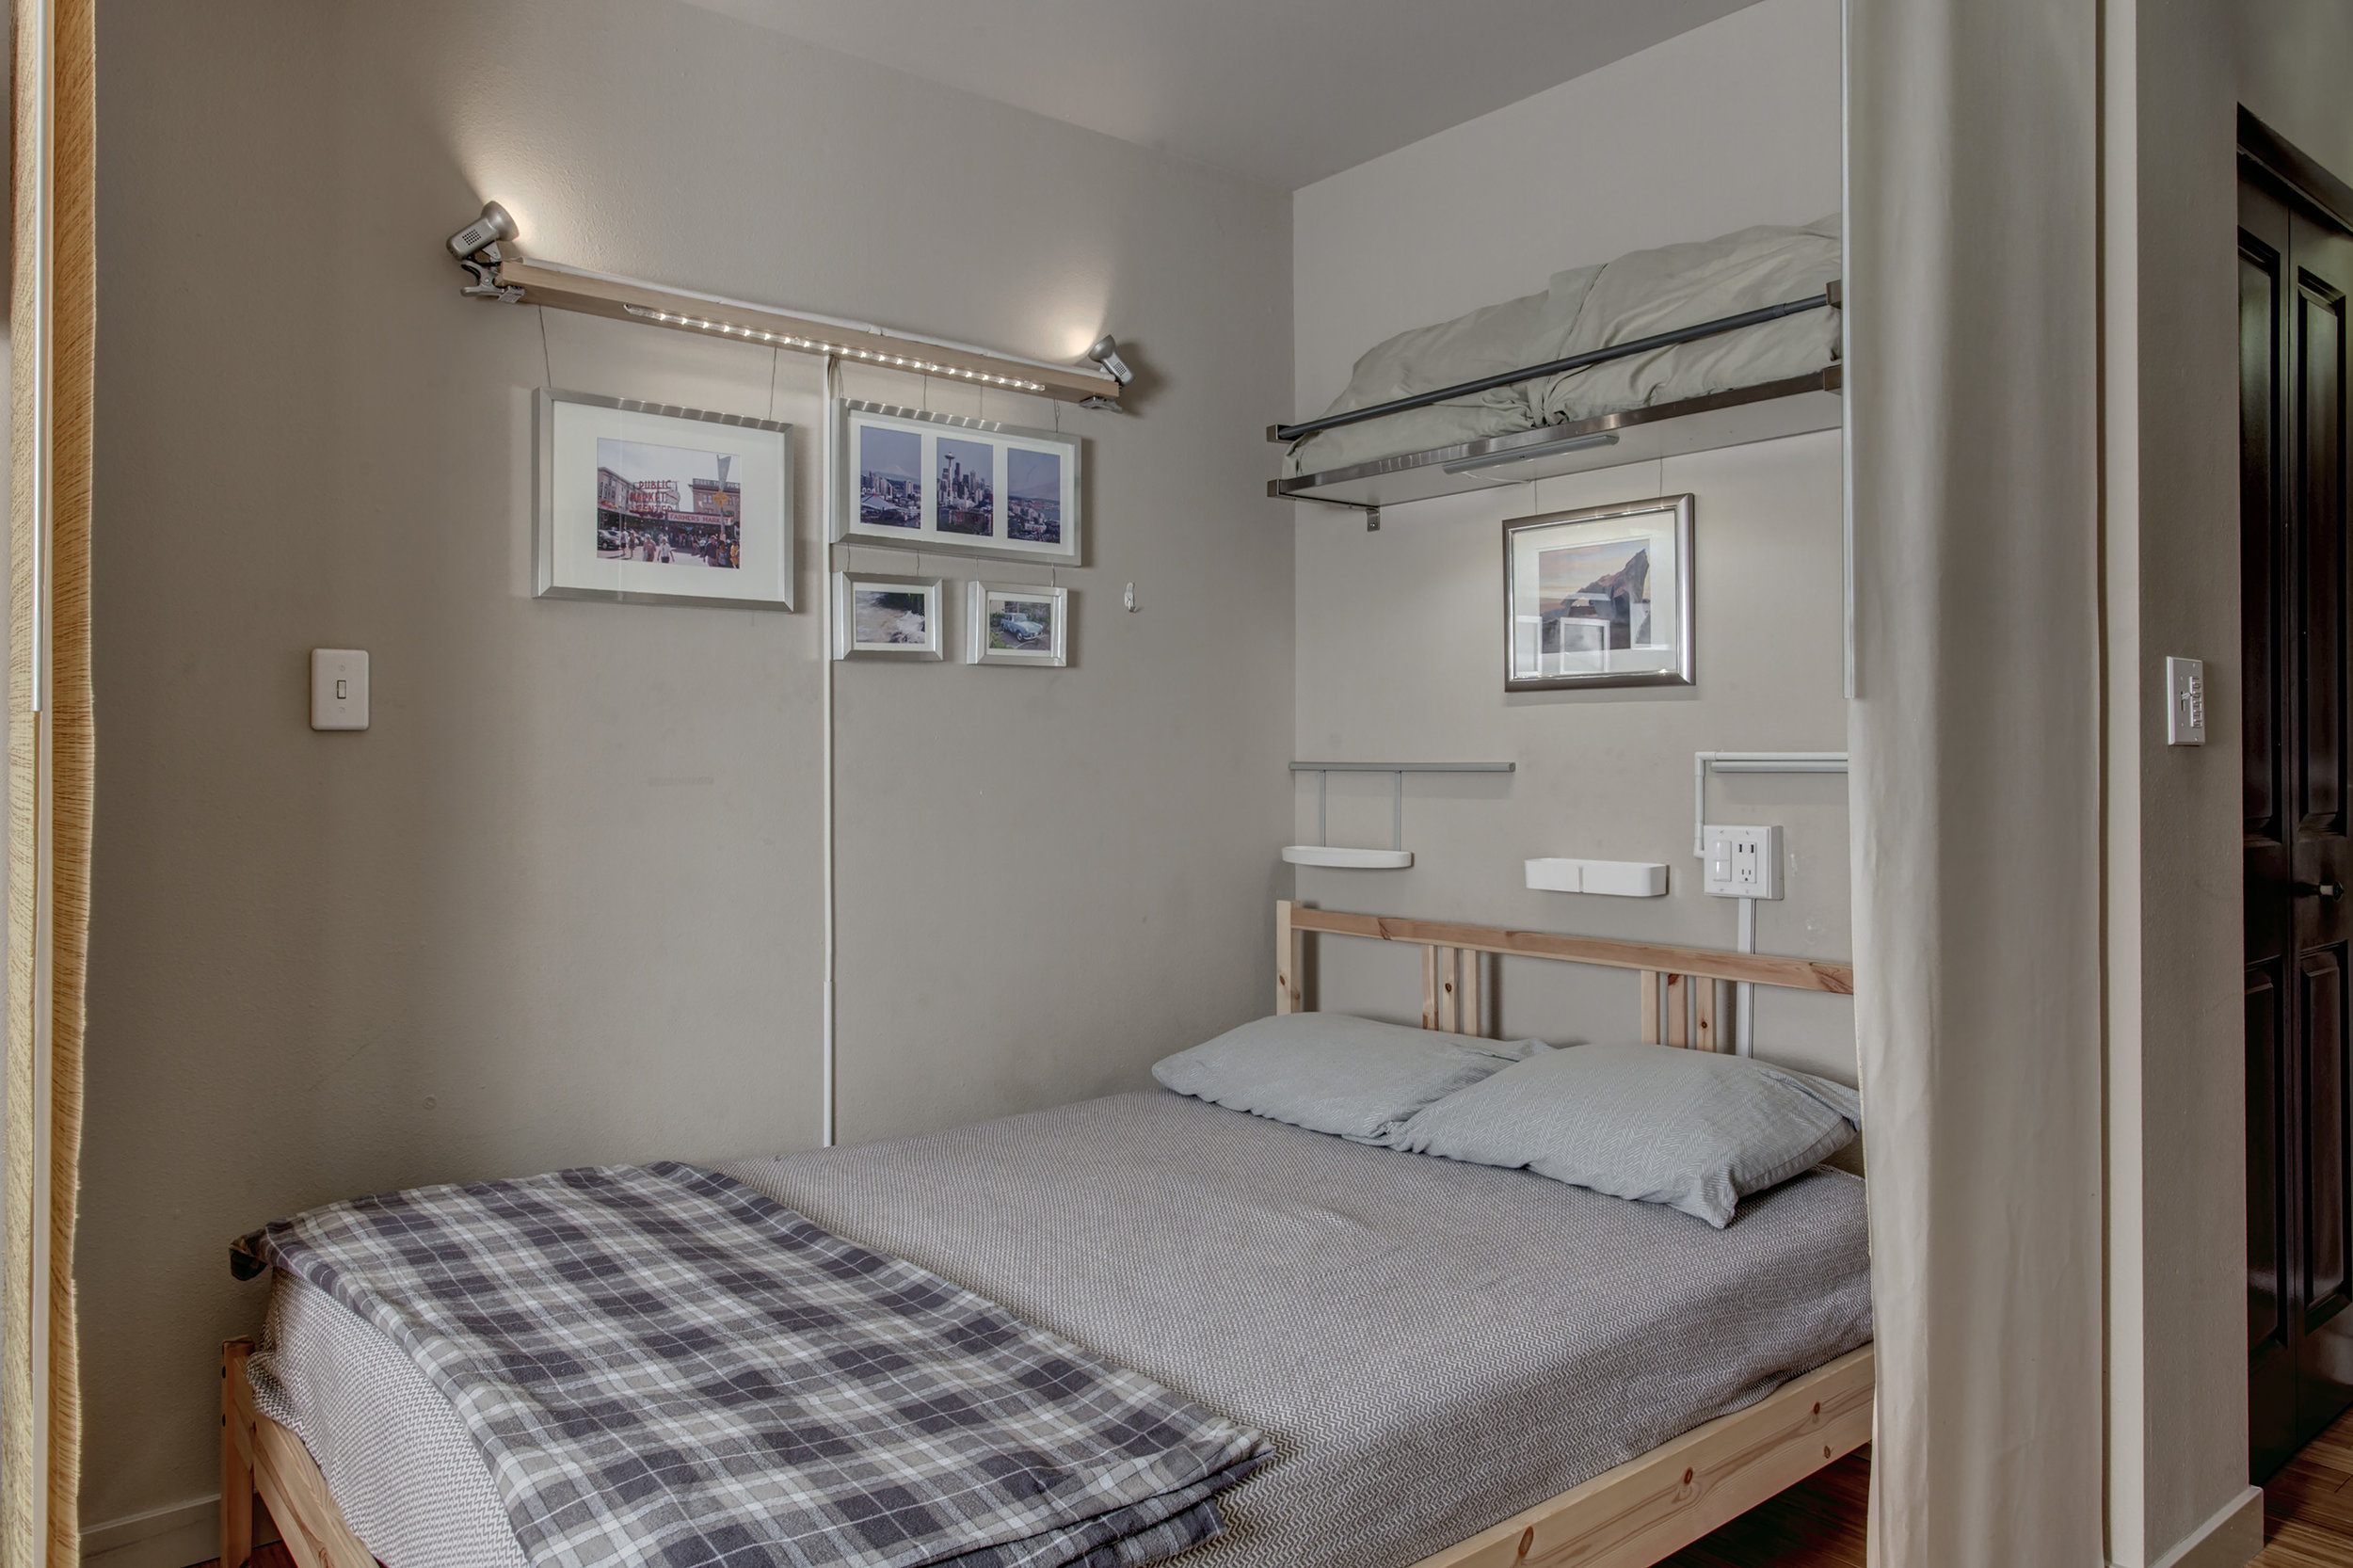 17-Bedroom01.jpg